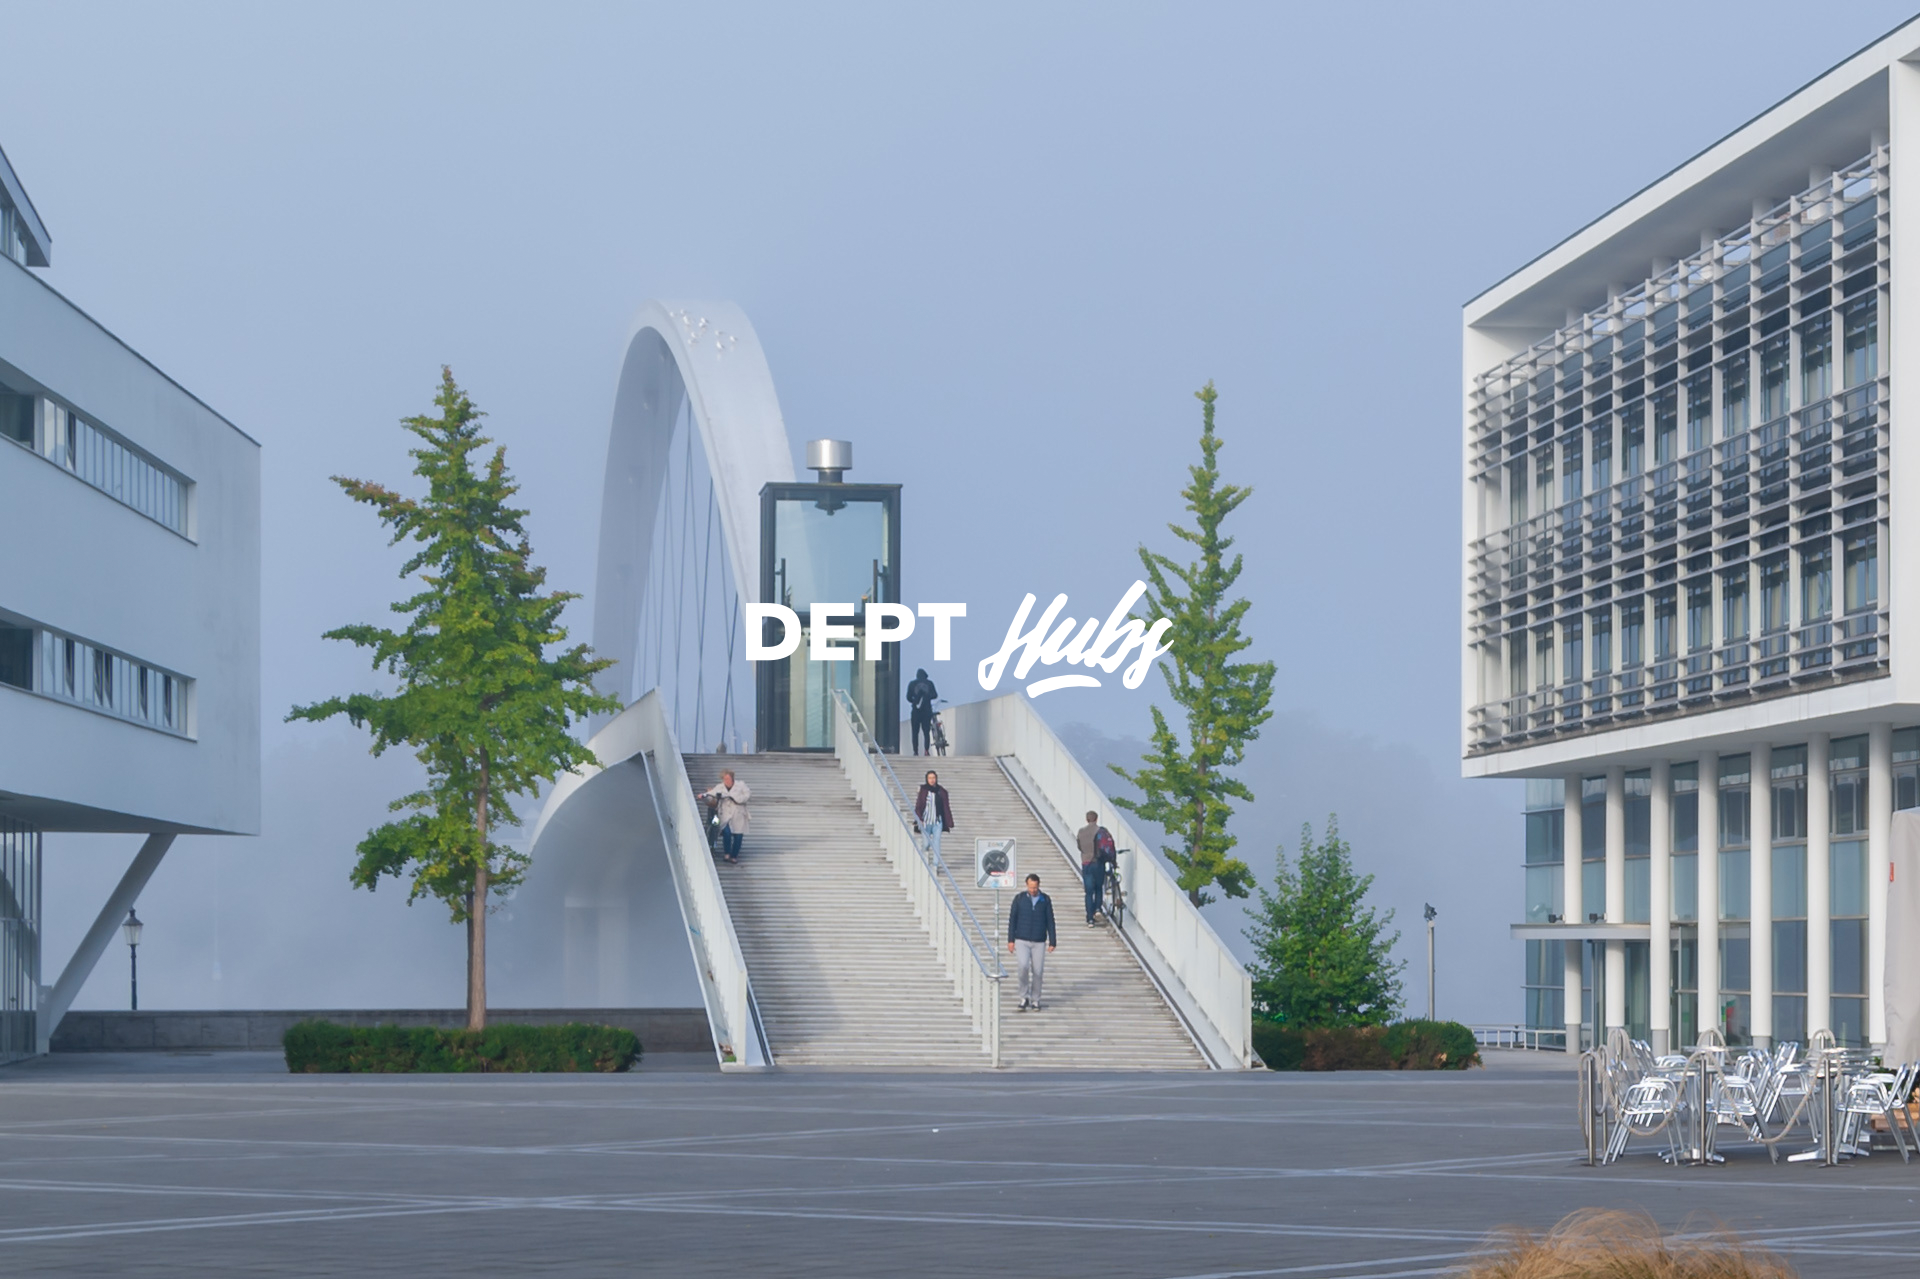 Dept Hubs Maastricht